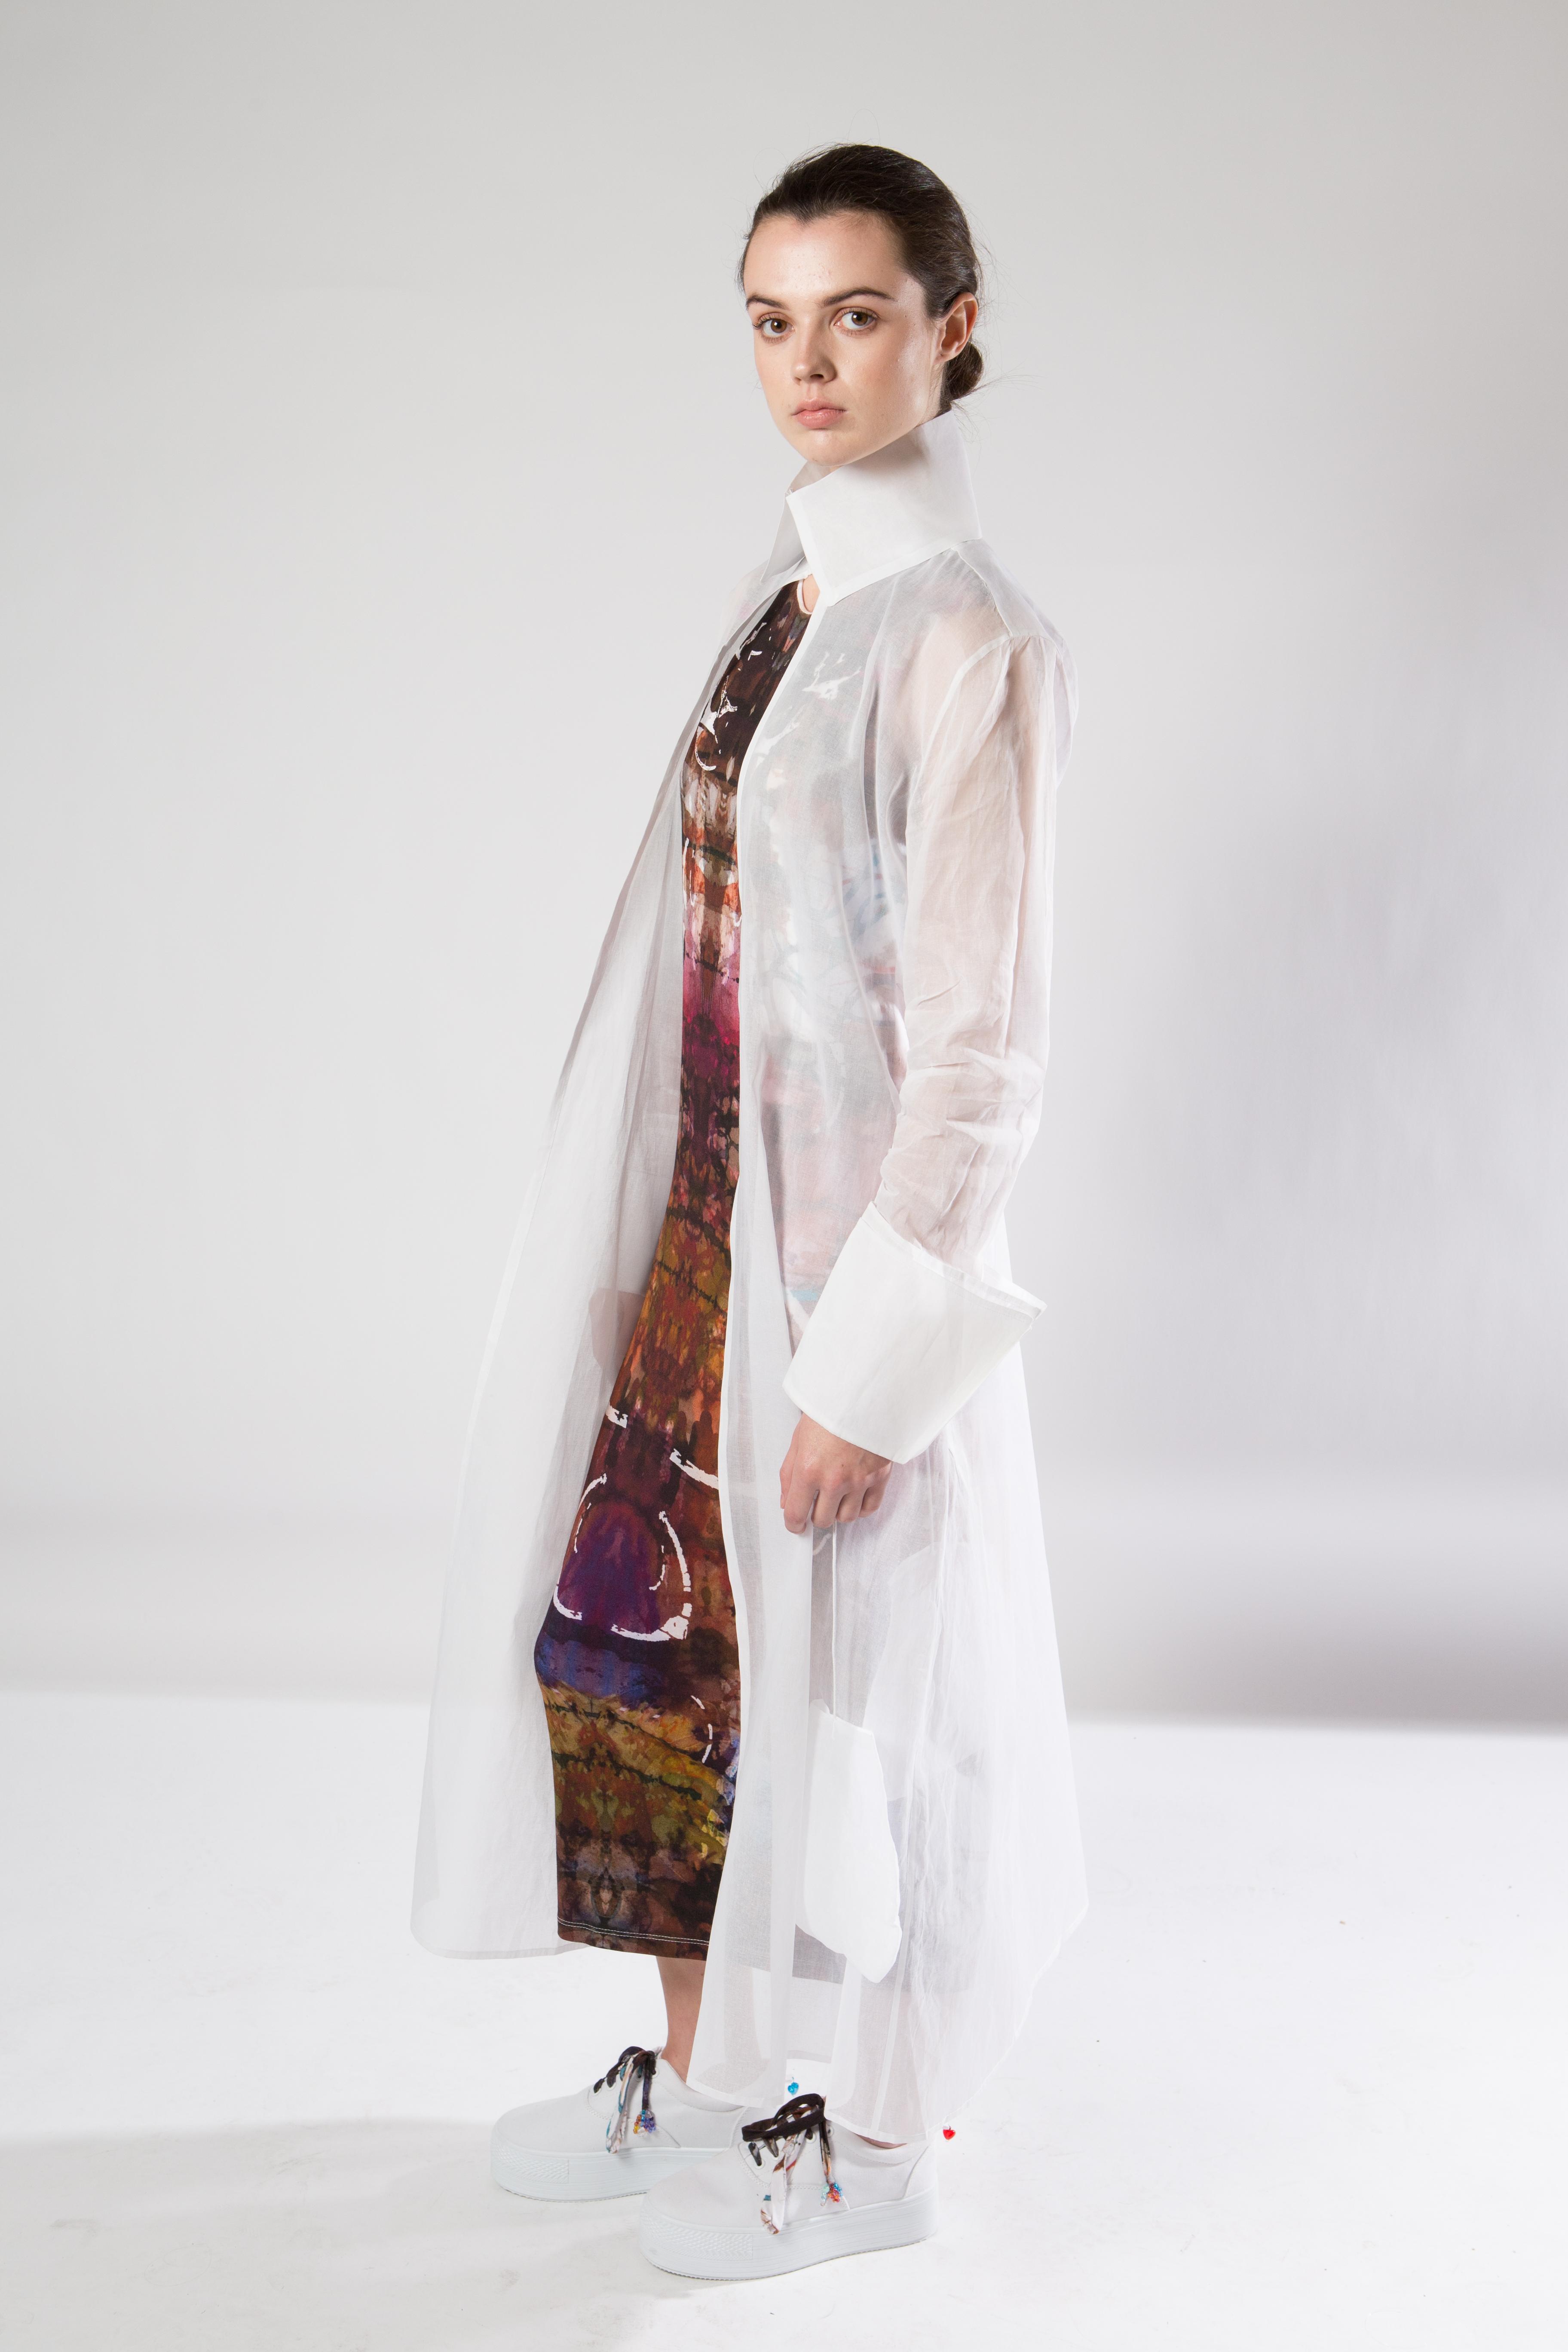 Clare Coat Reflection (3)